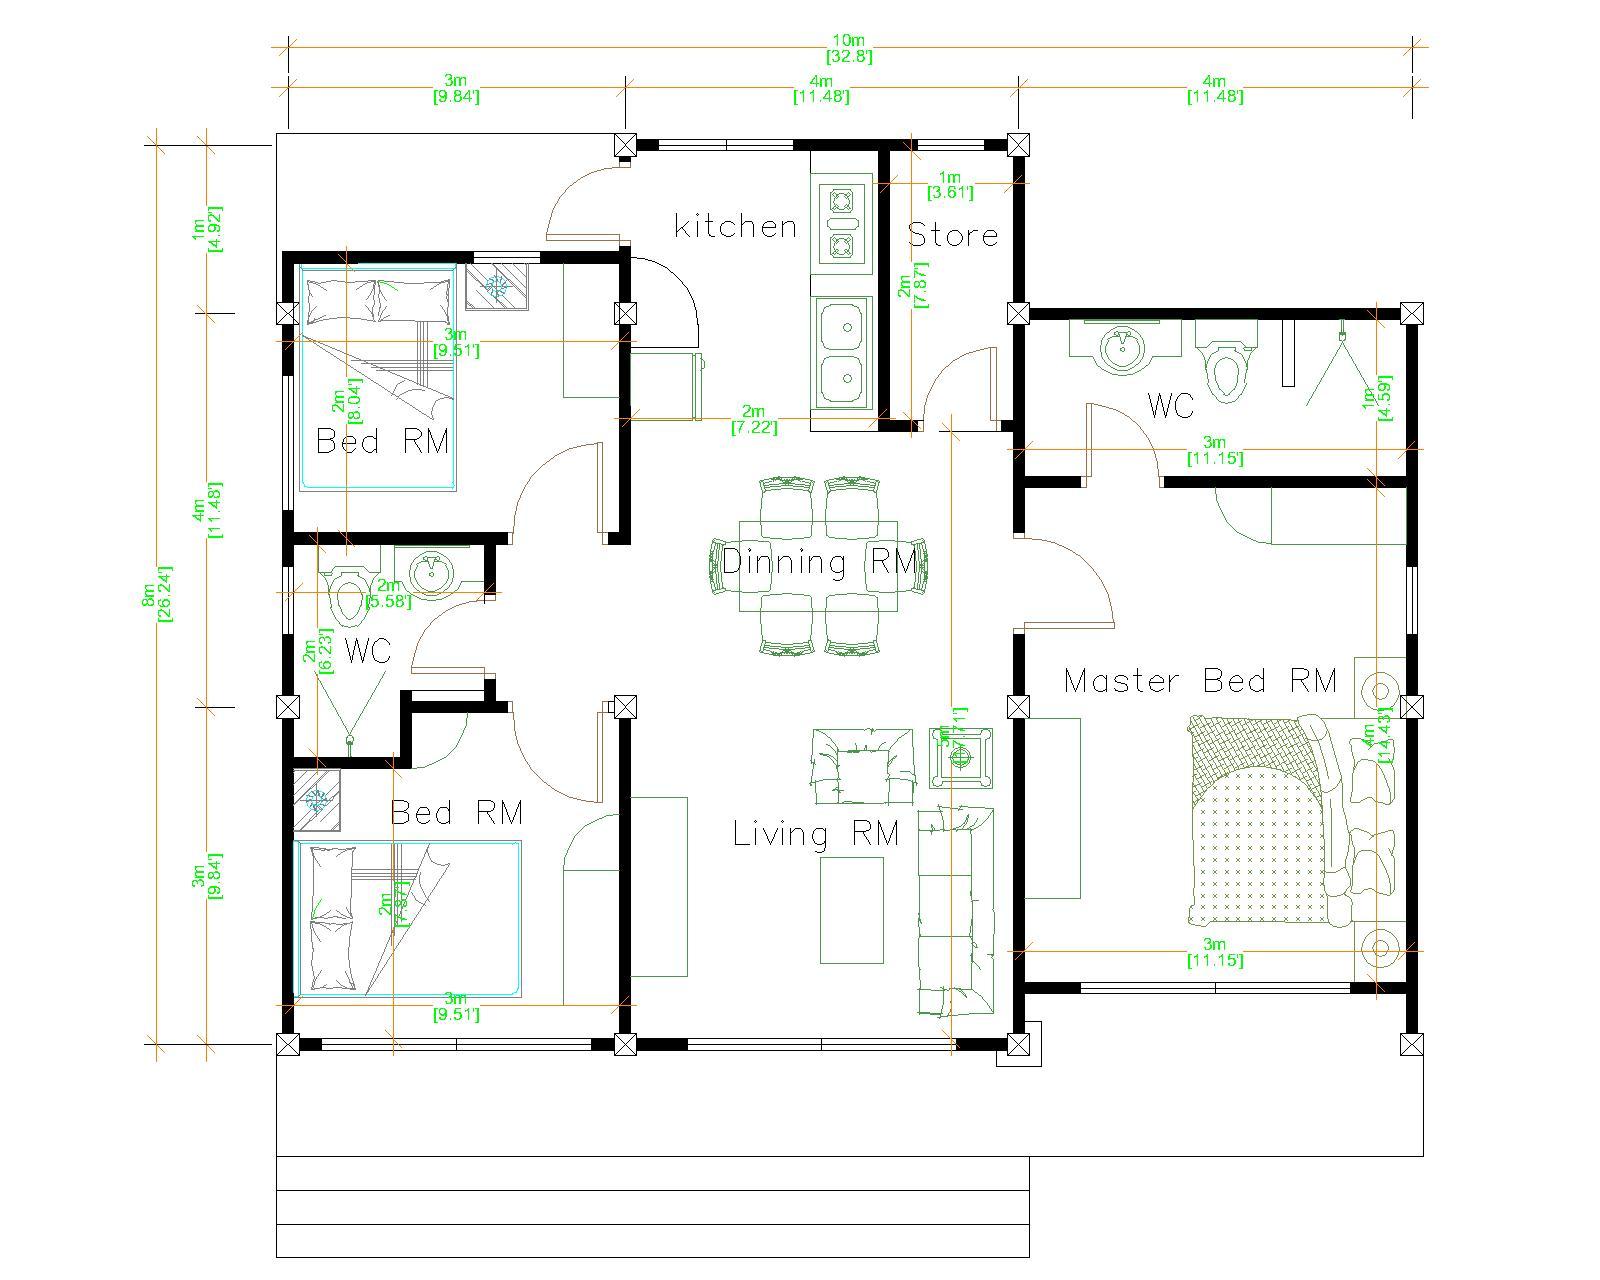 Small House Plans 10x8 Meter 27x34 Feet 3 Beds floor plan